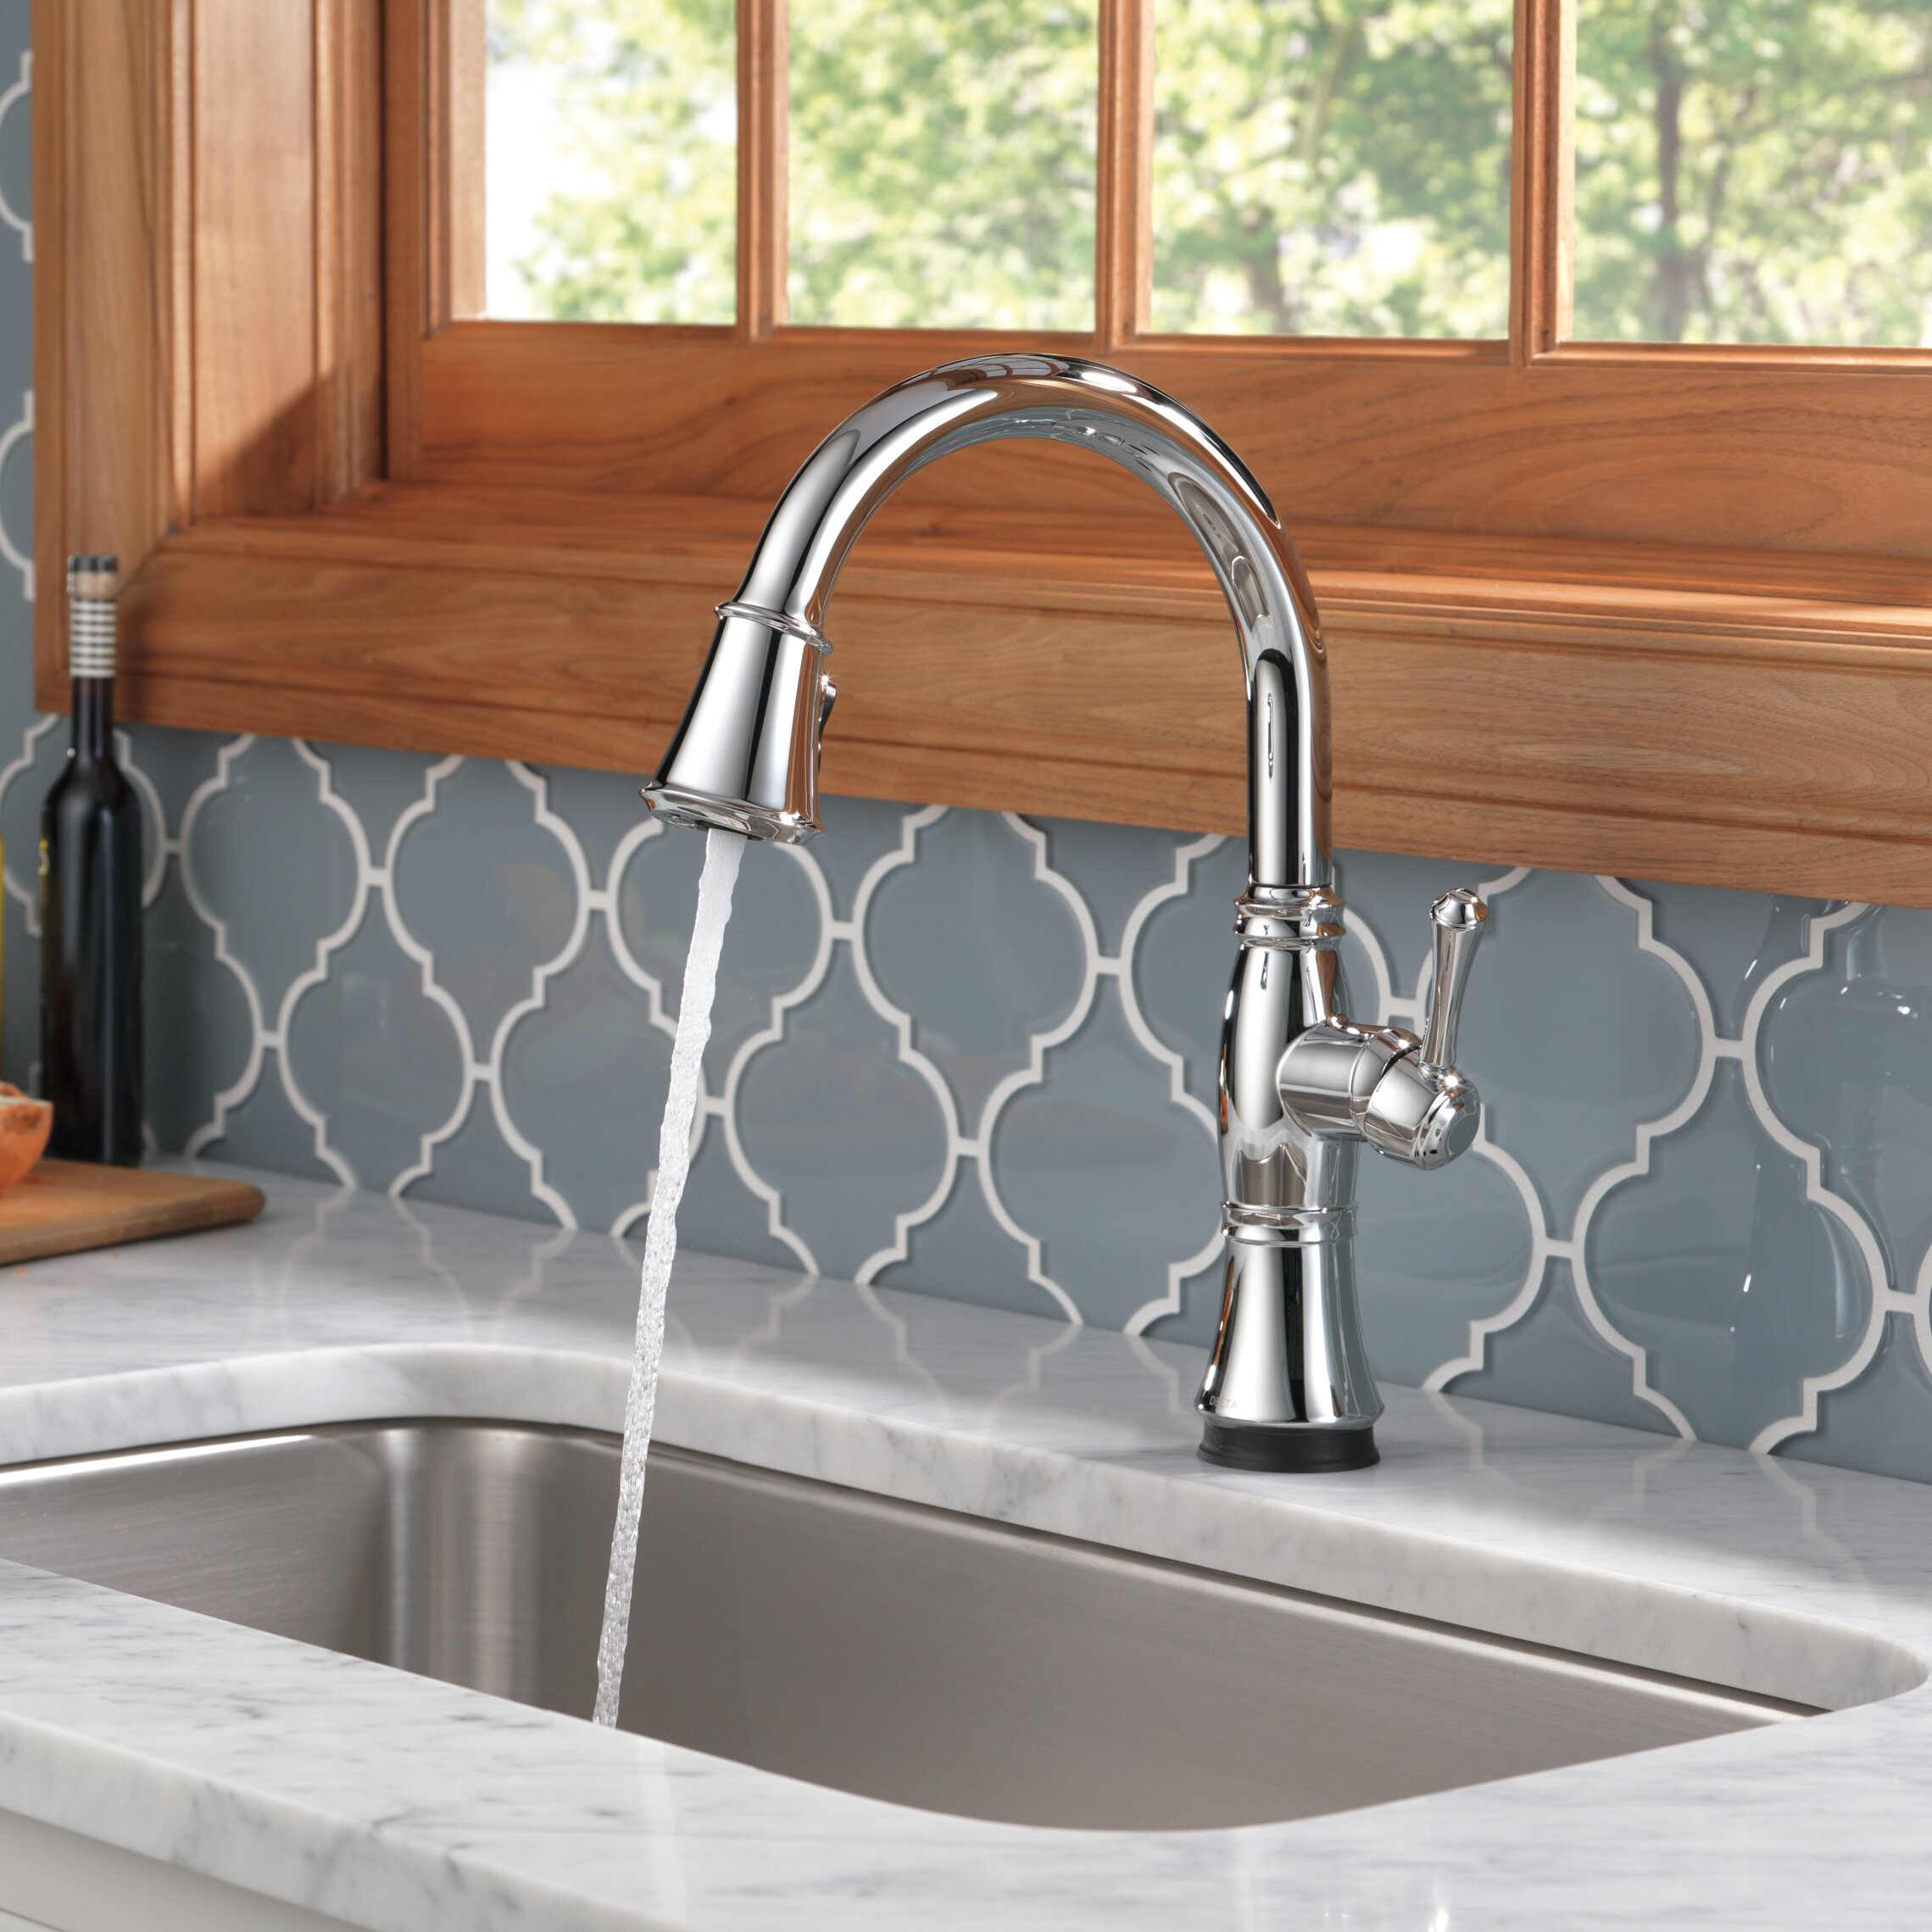 Delta Kitchen Faucet Reviews Delta Cassidy Single Handle Standard Kitchen Faucet Reviews